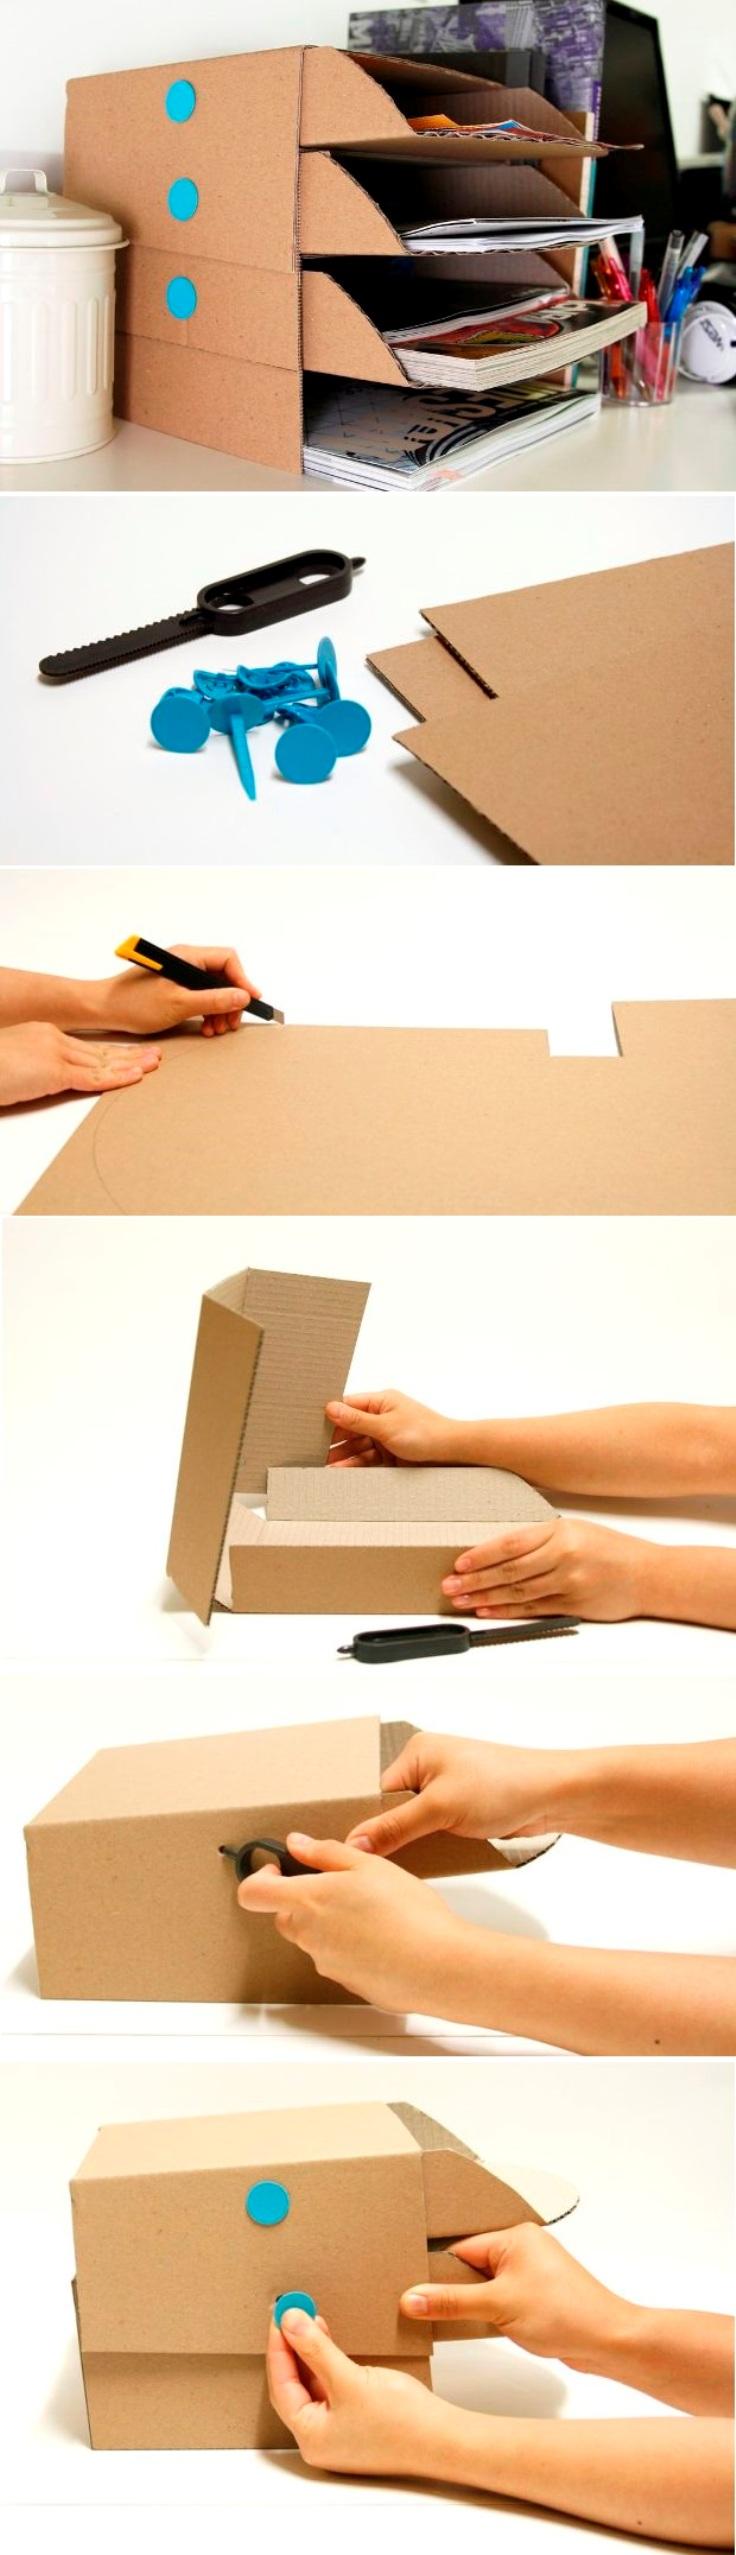 easy-creative-diy-desk-trays_06